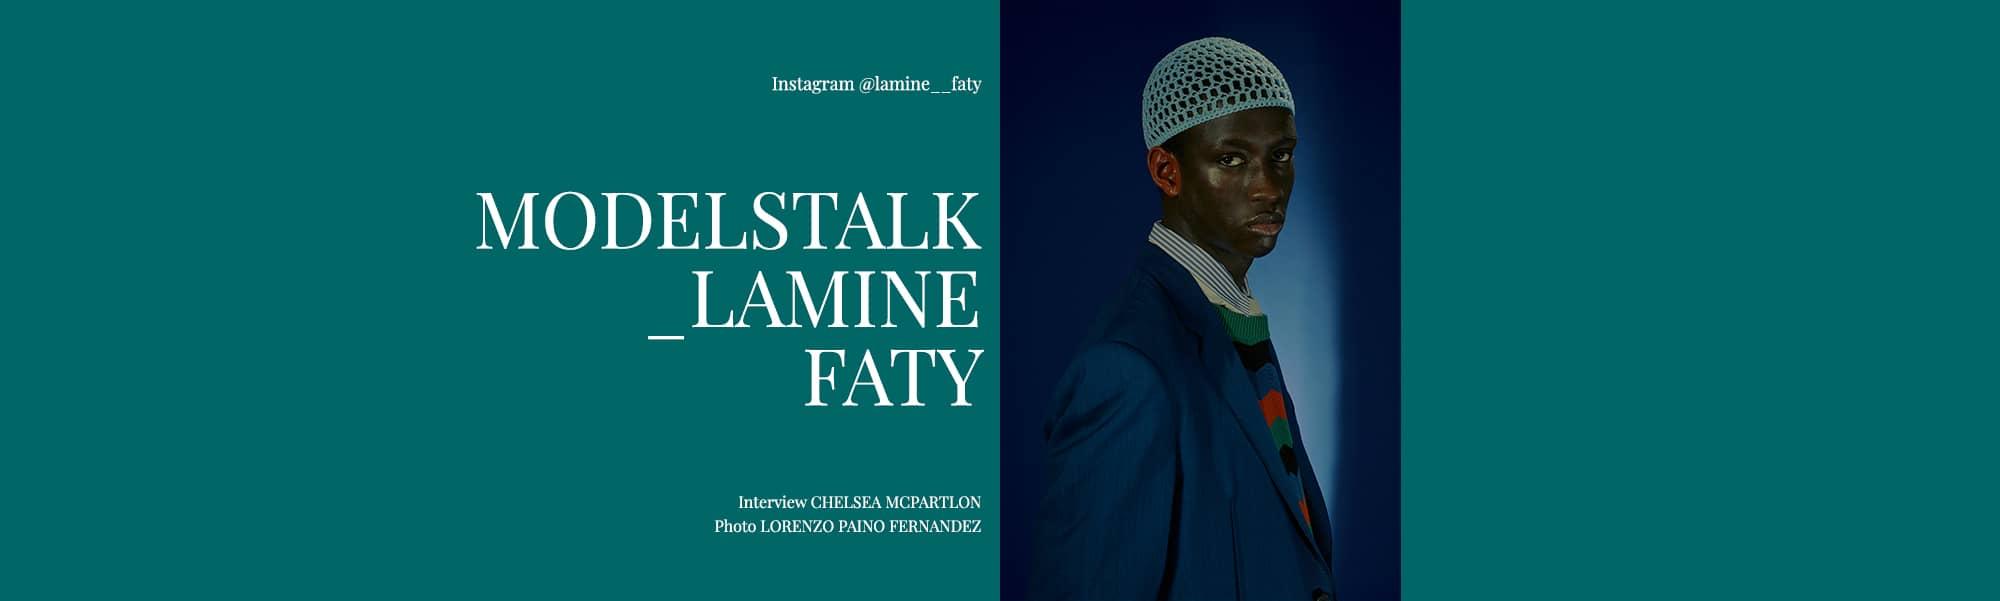 thegreatestmagazine_LAMINE-faty-talkingheads-banner-hp